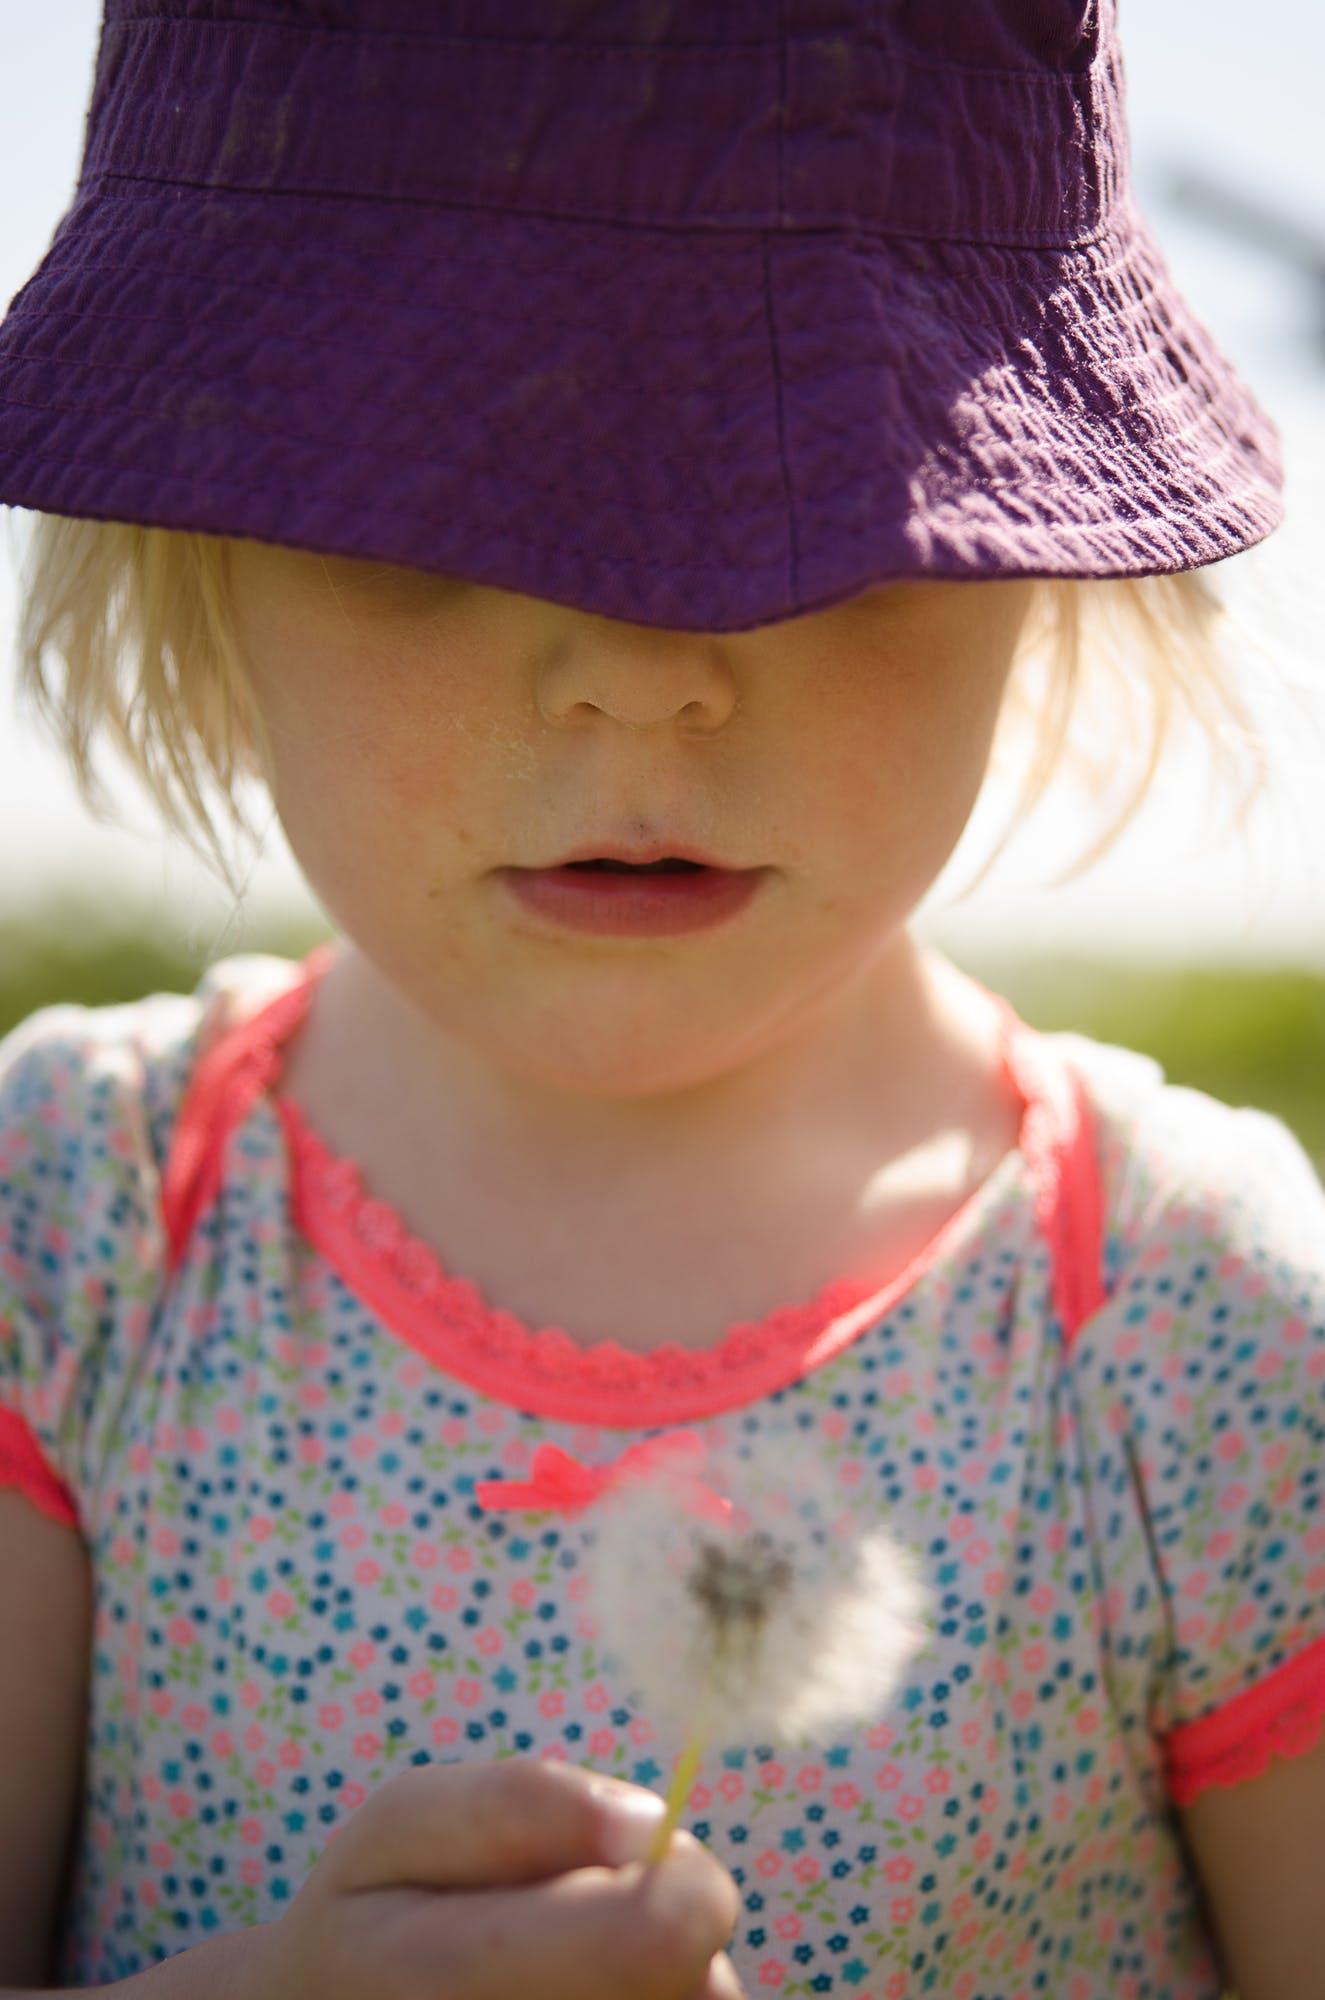 Free stock photo of child, dandelion seeds, outdoor, summer